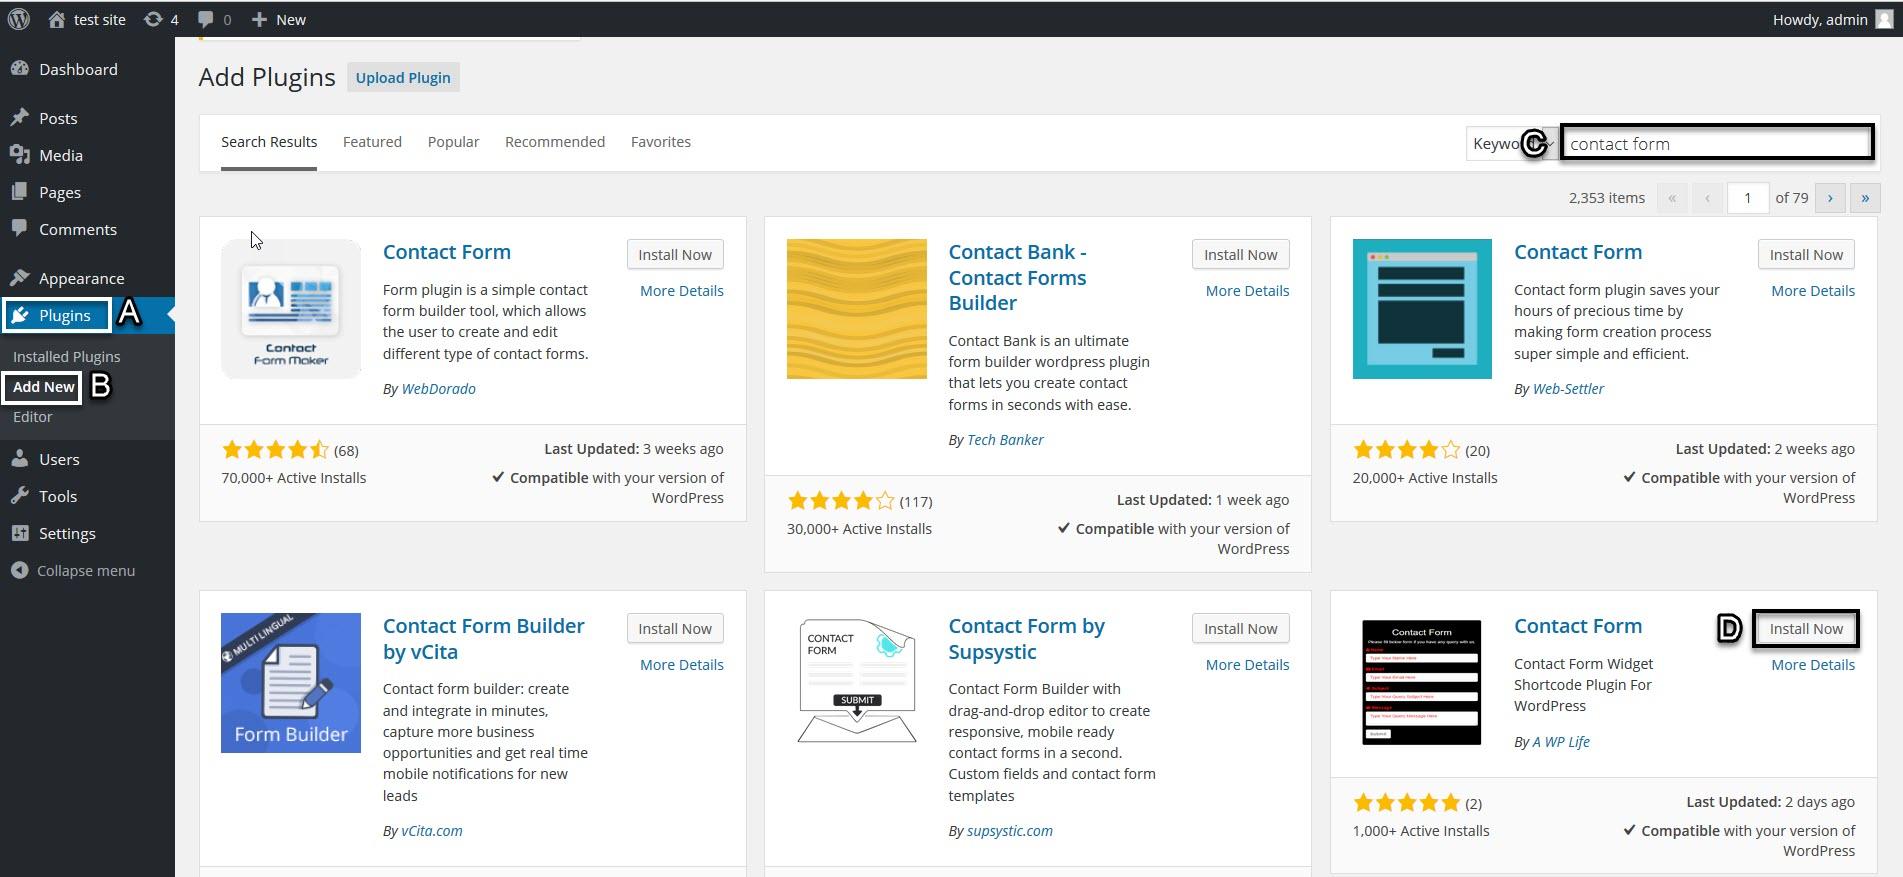 WordPress Contact Form Download & Installation